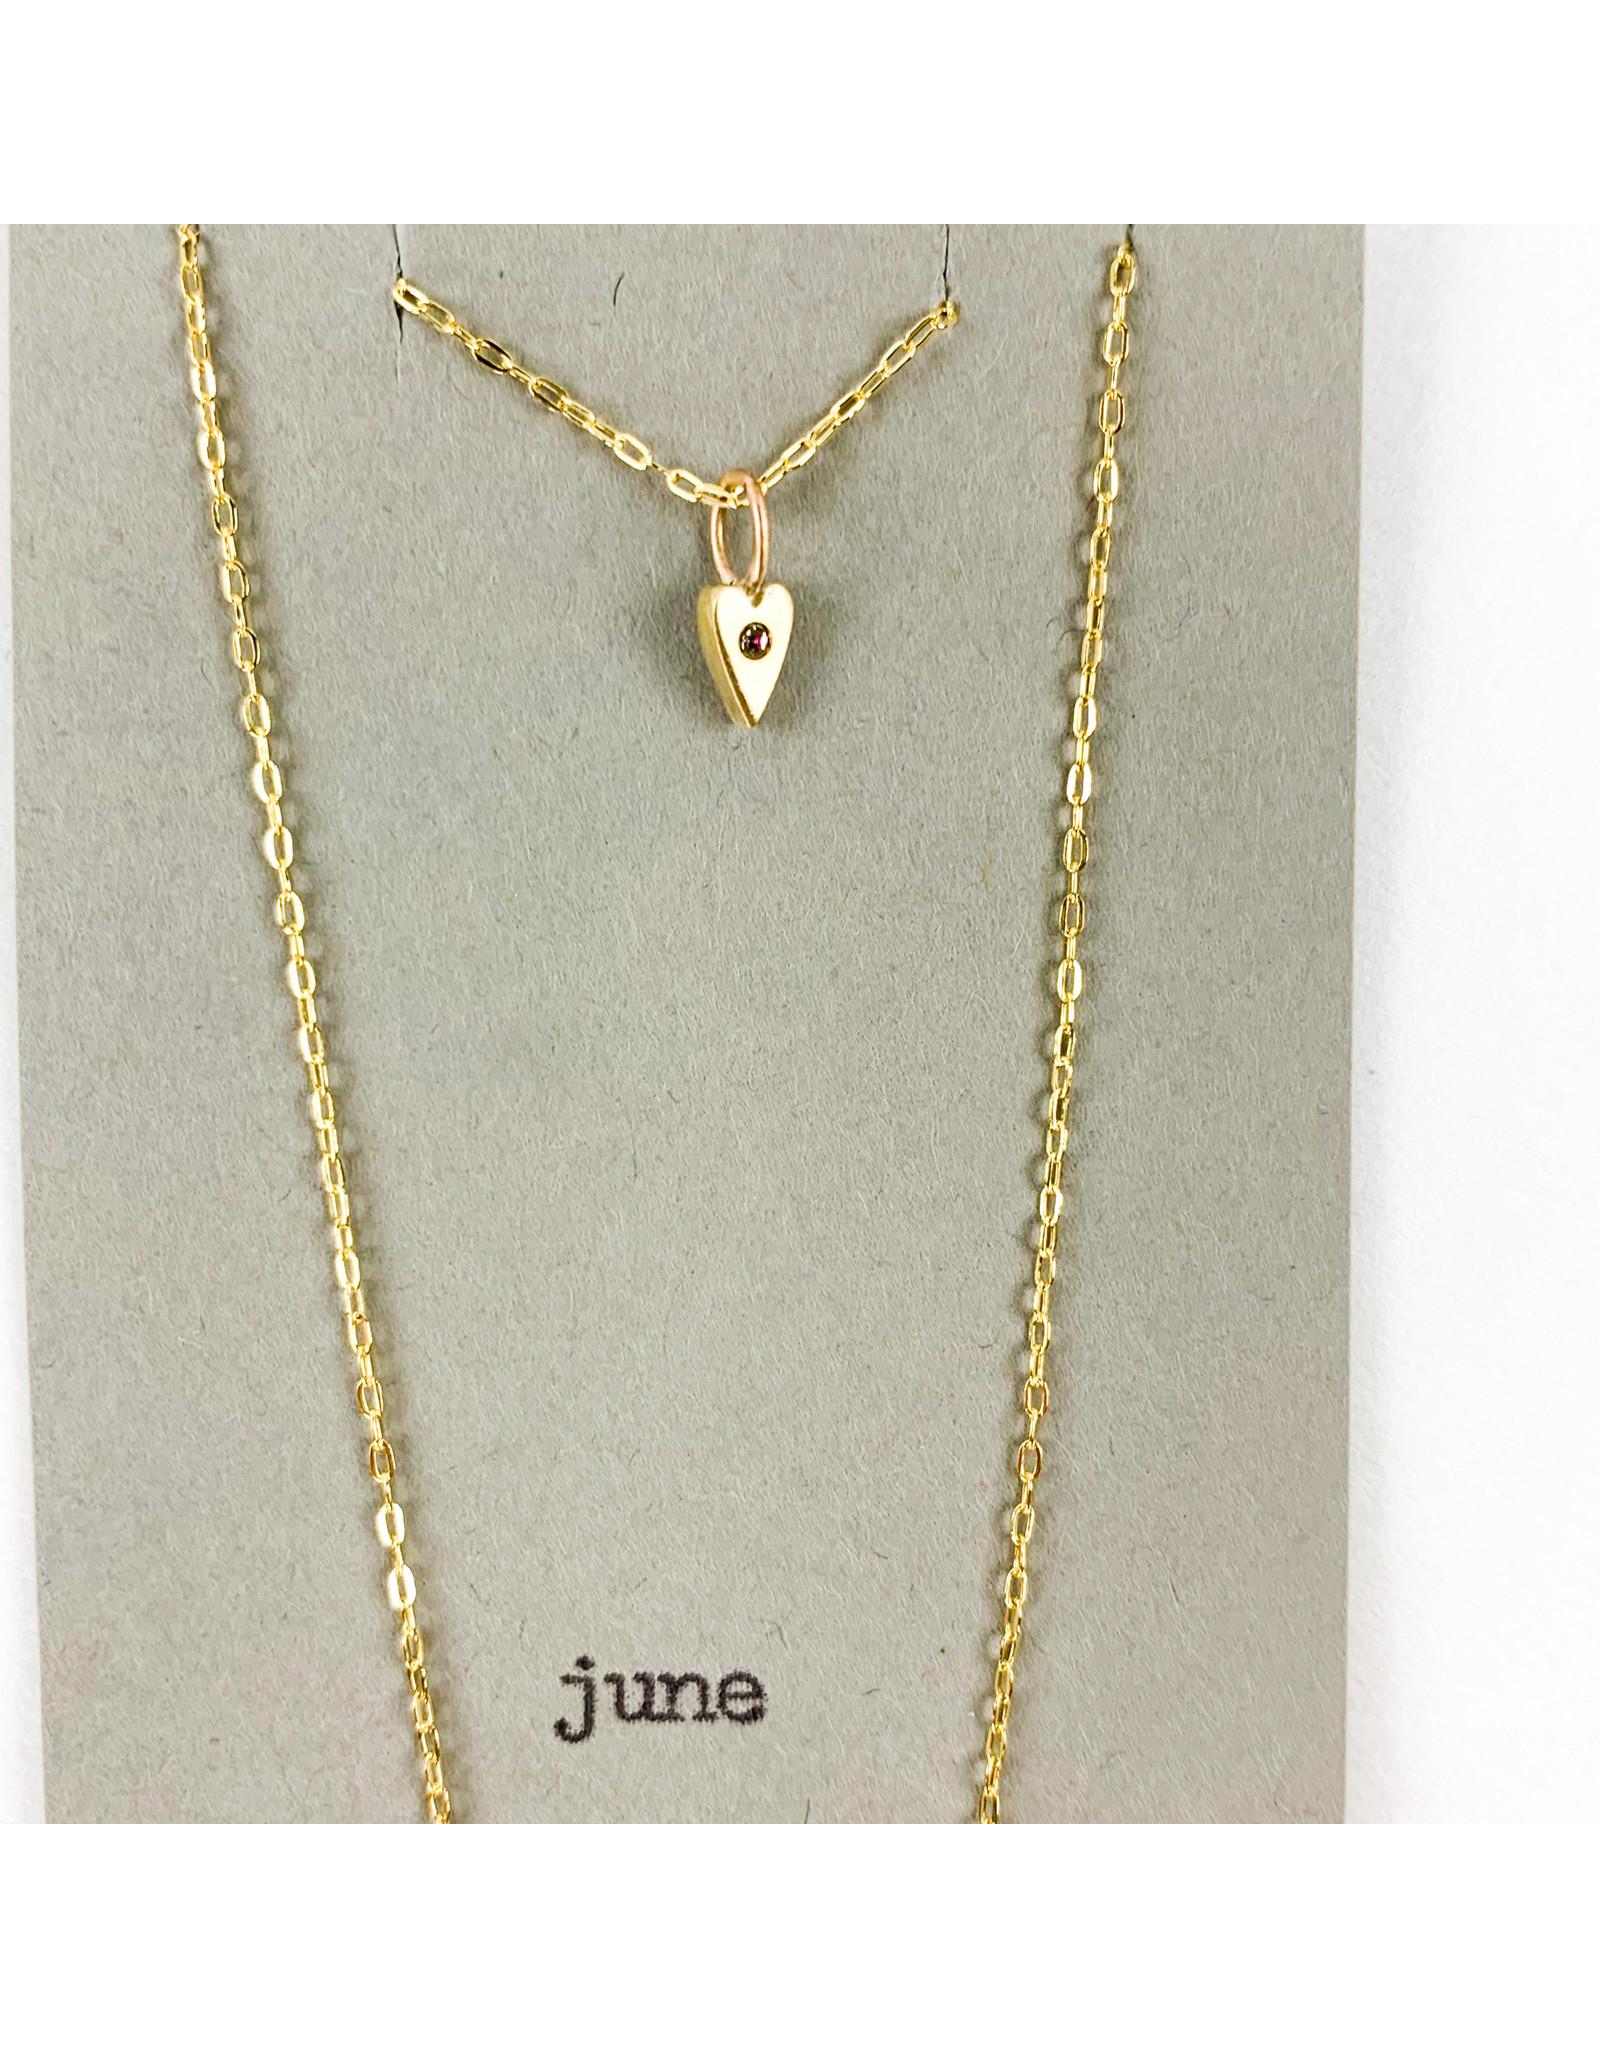 penny larsen June Necklace/ Alexandrite Gold Chain